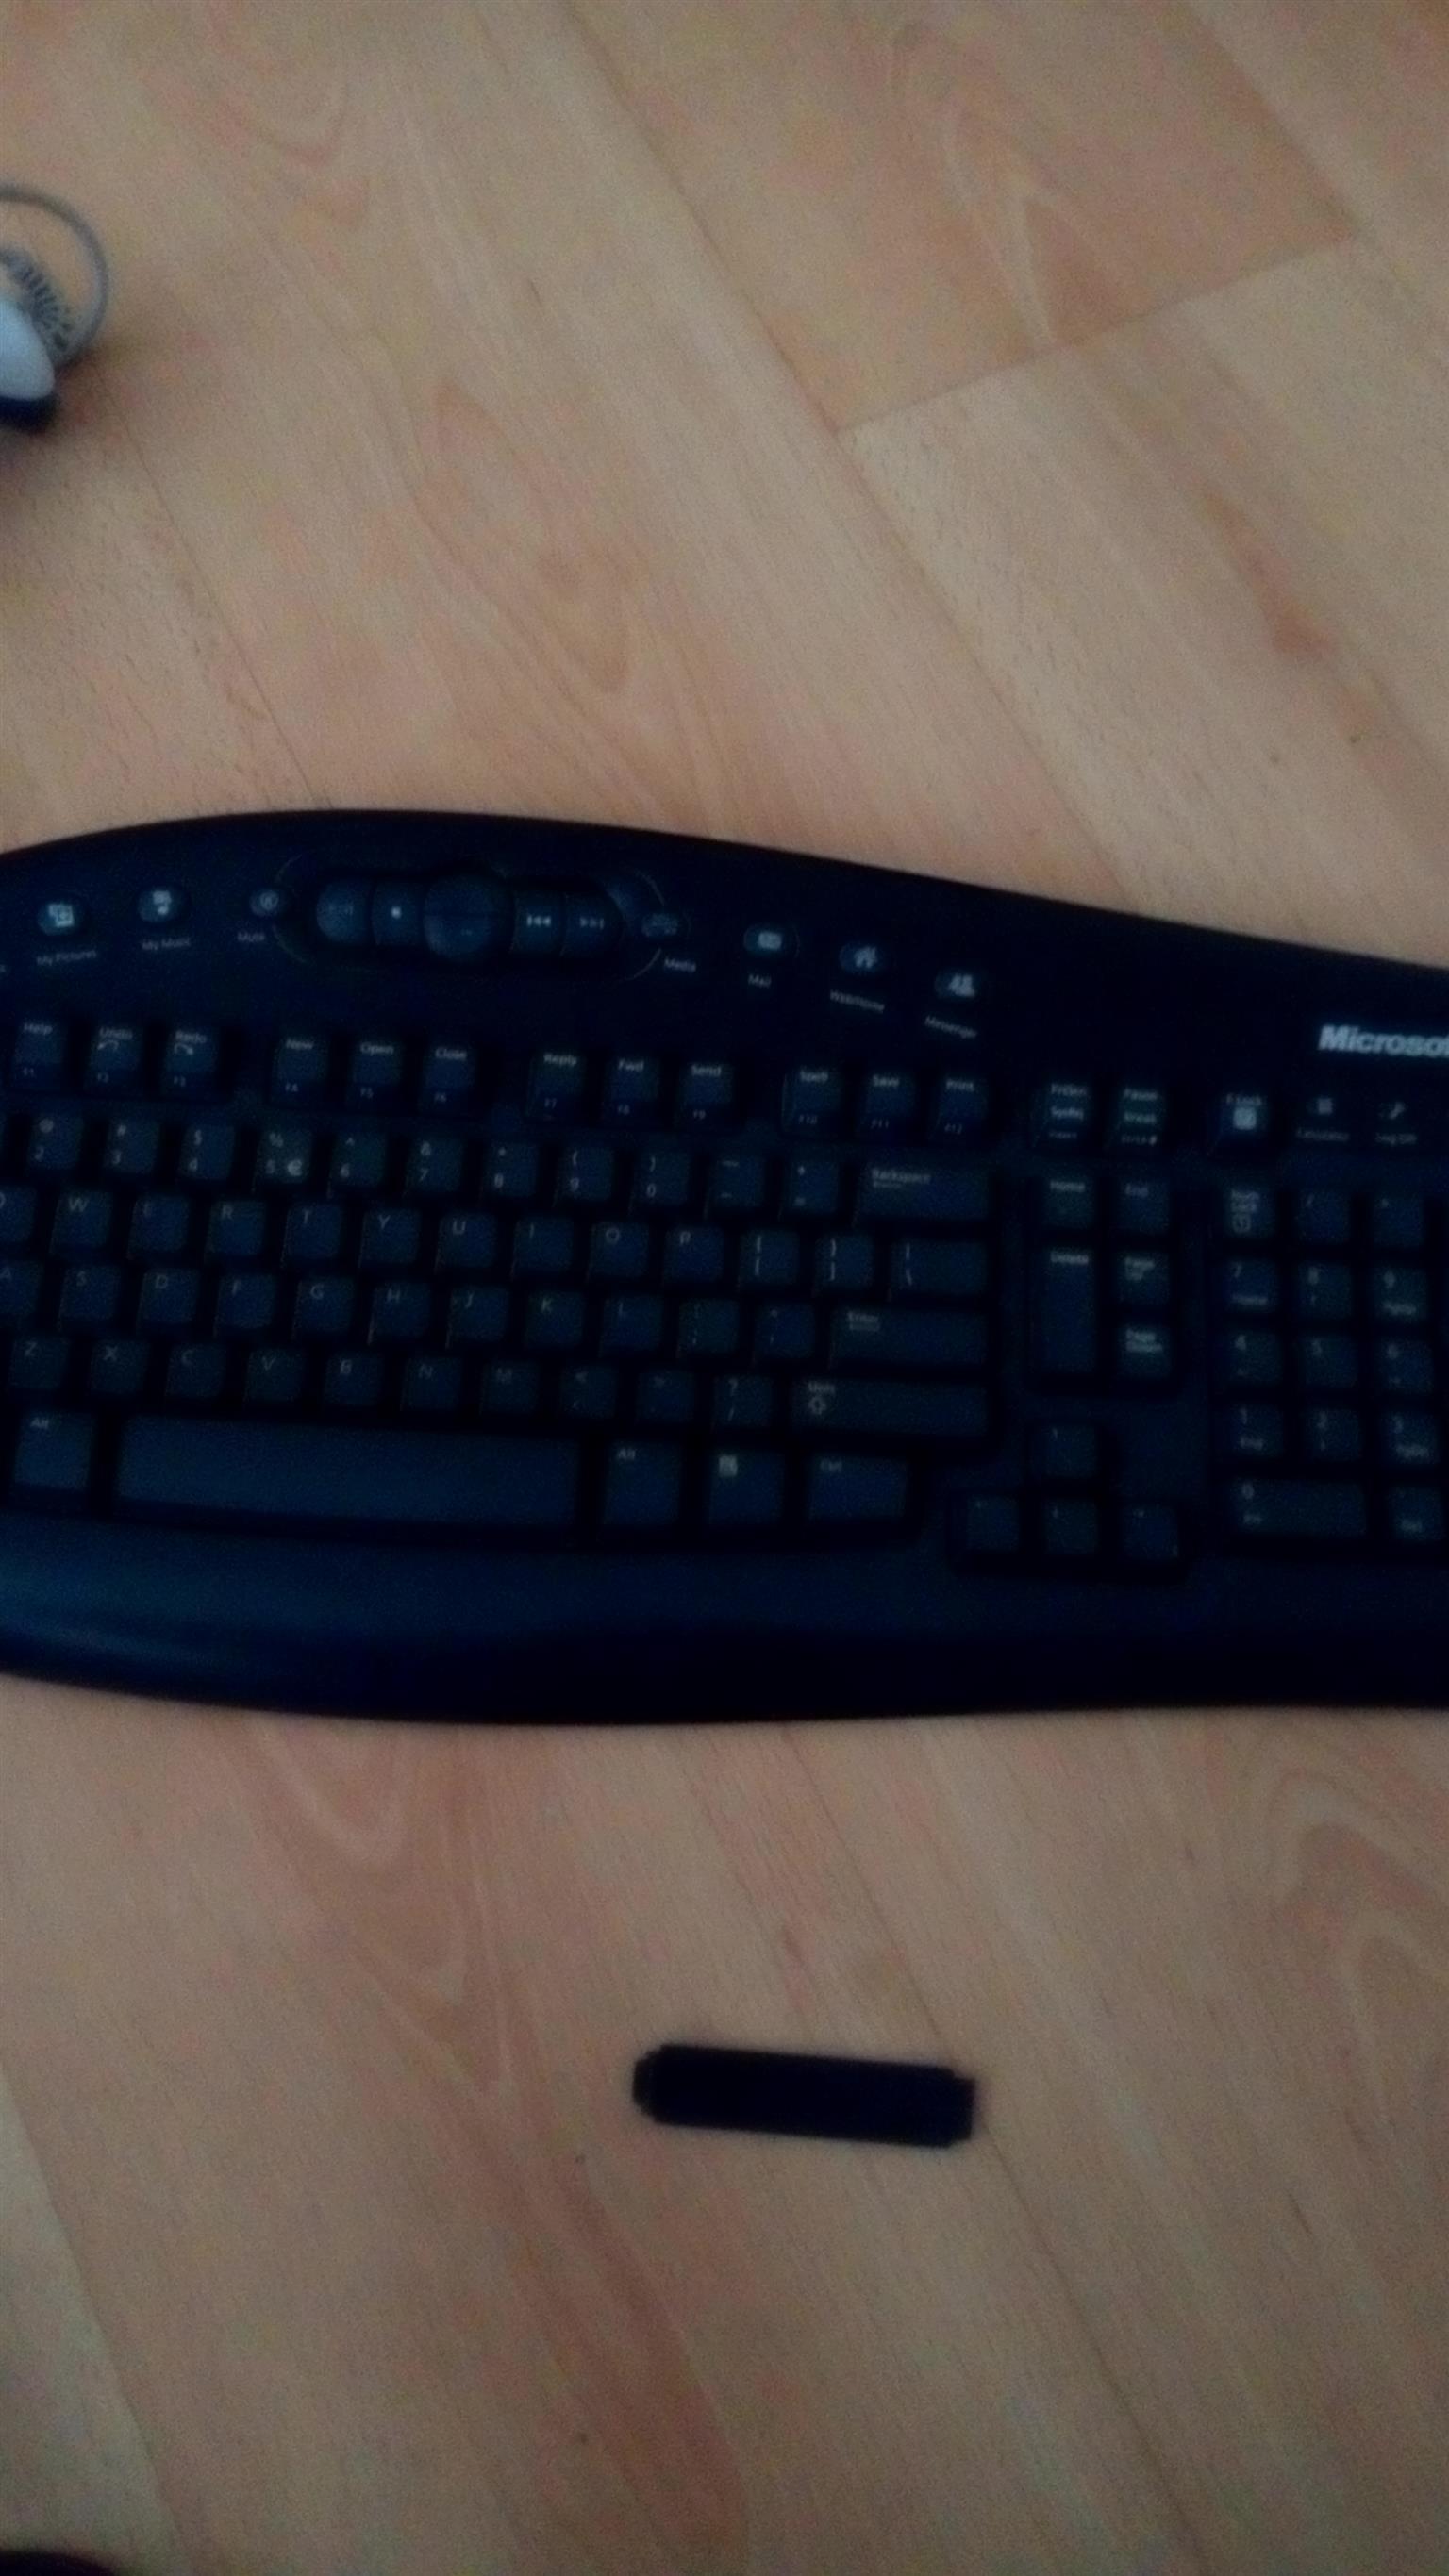 c1a94f2f906 Wireless keyboard +free mouse | Junk Mail